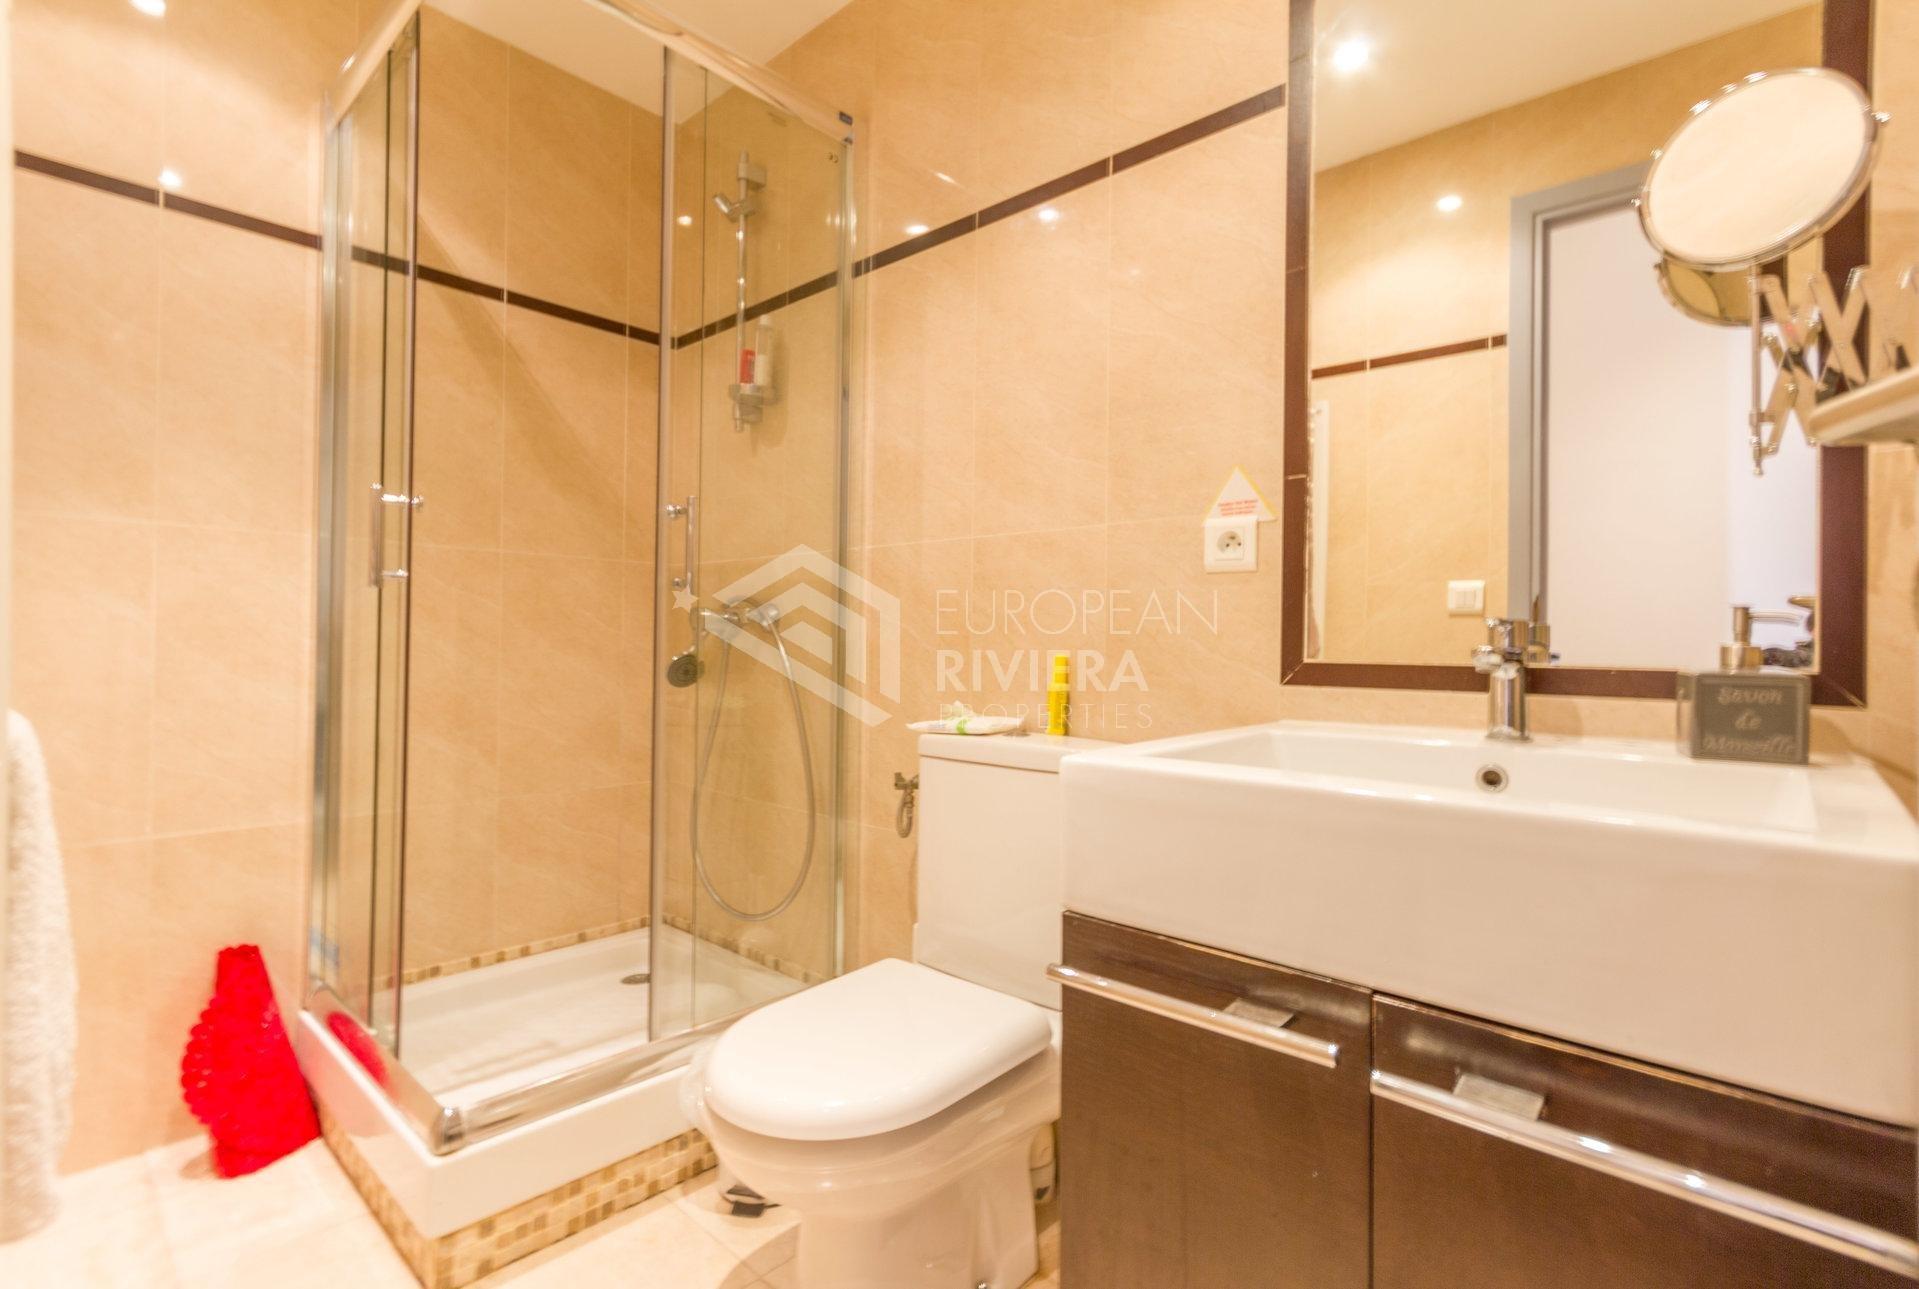 Affitto Appartamento - Nizza (Nice) Rue de France